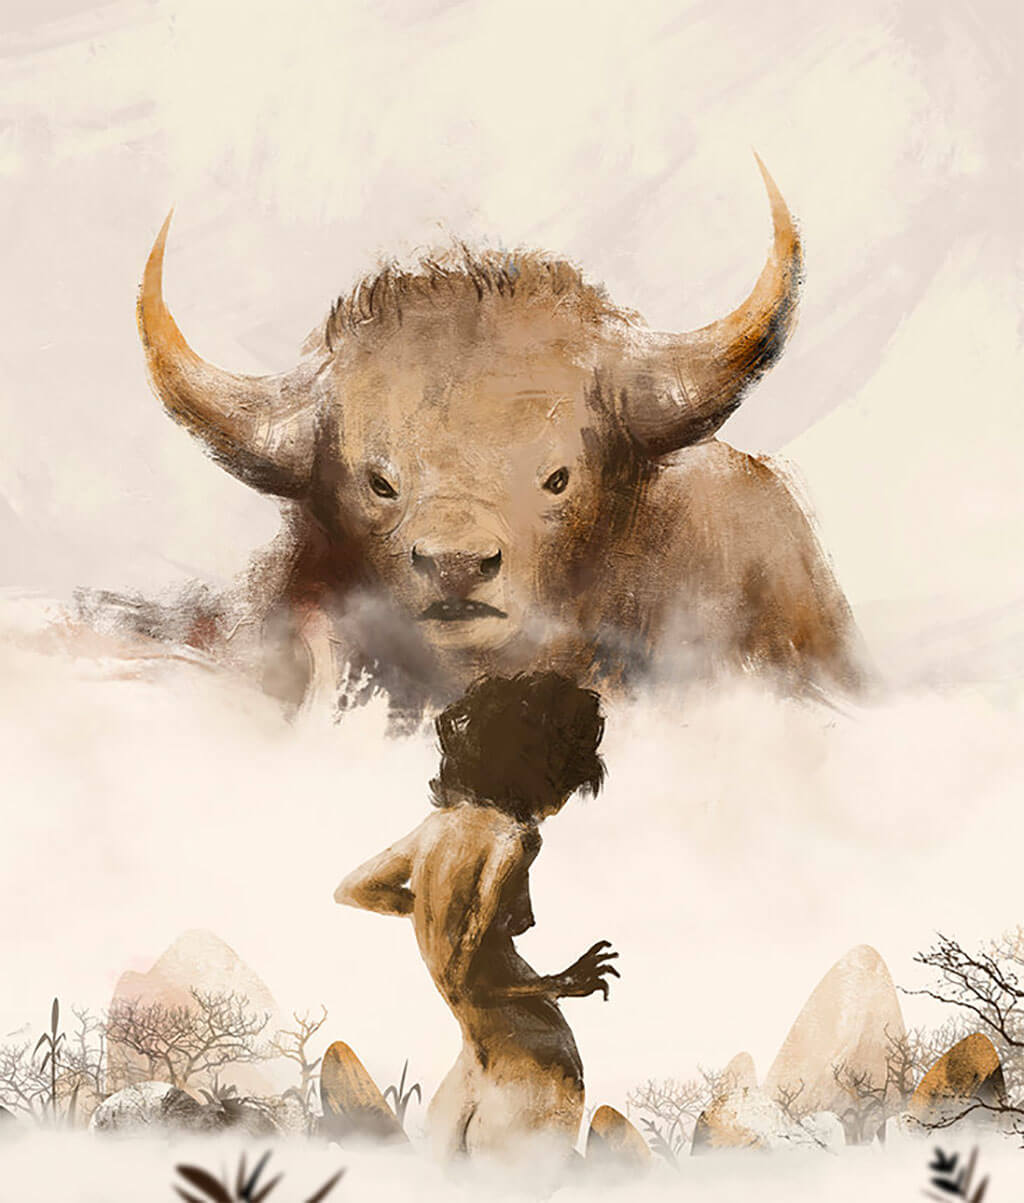 Beauty and the Beast Fan Art by Wajid Karim